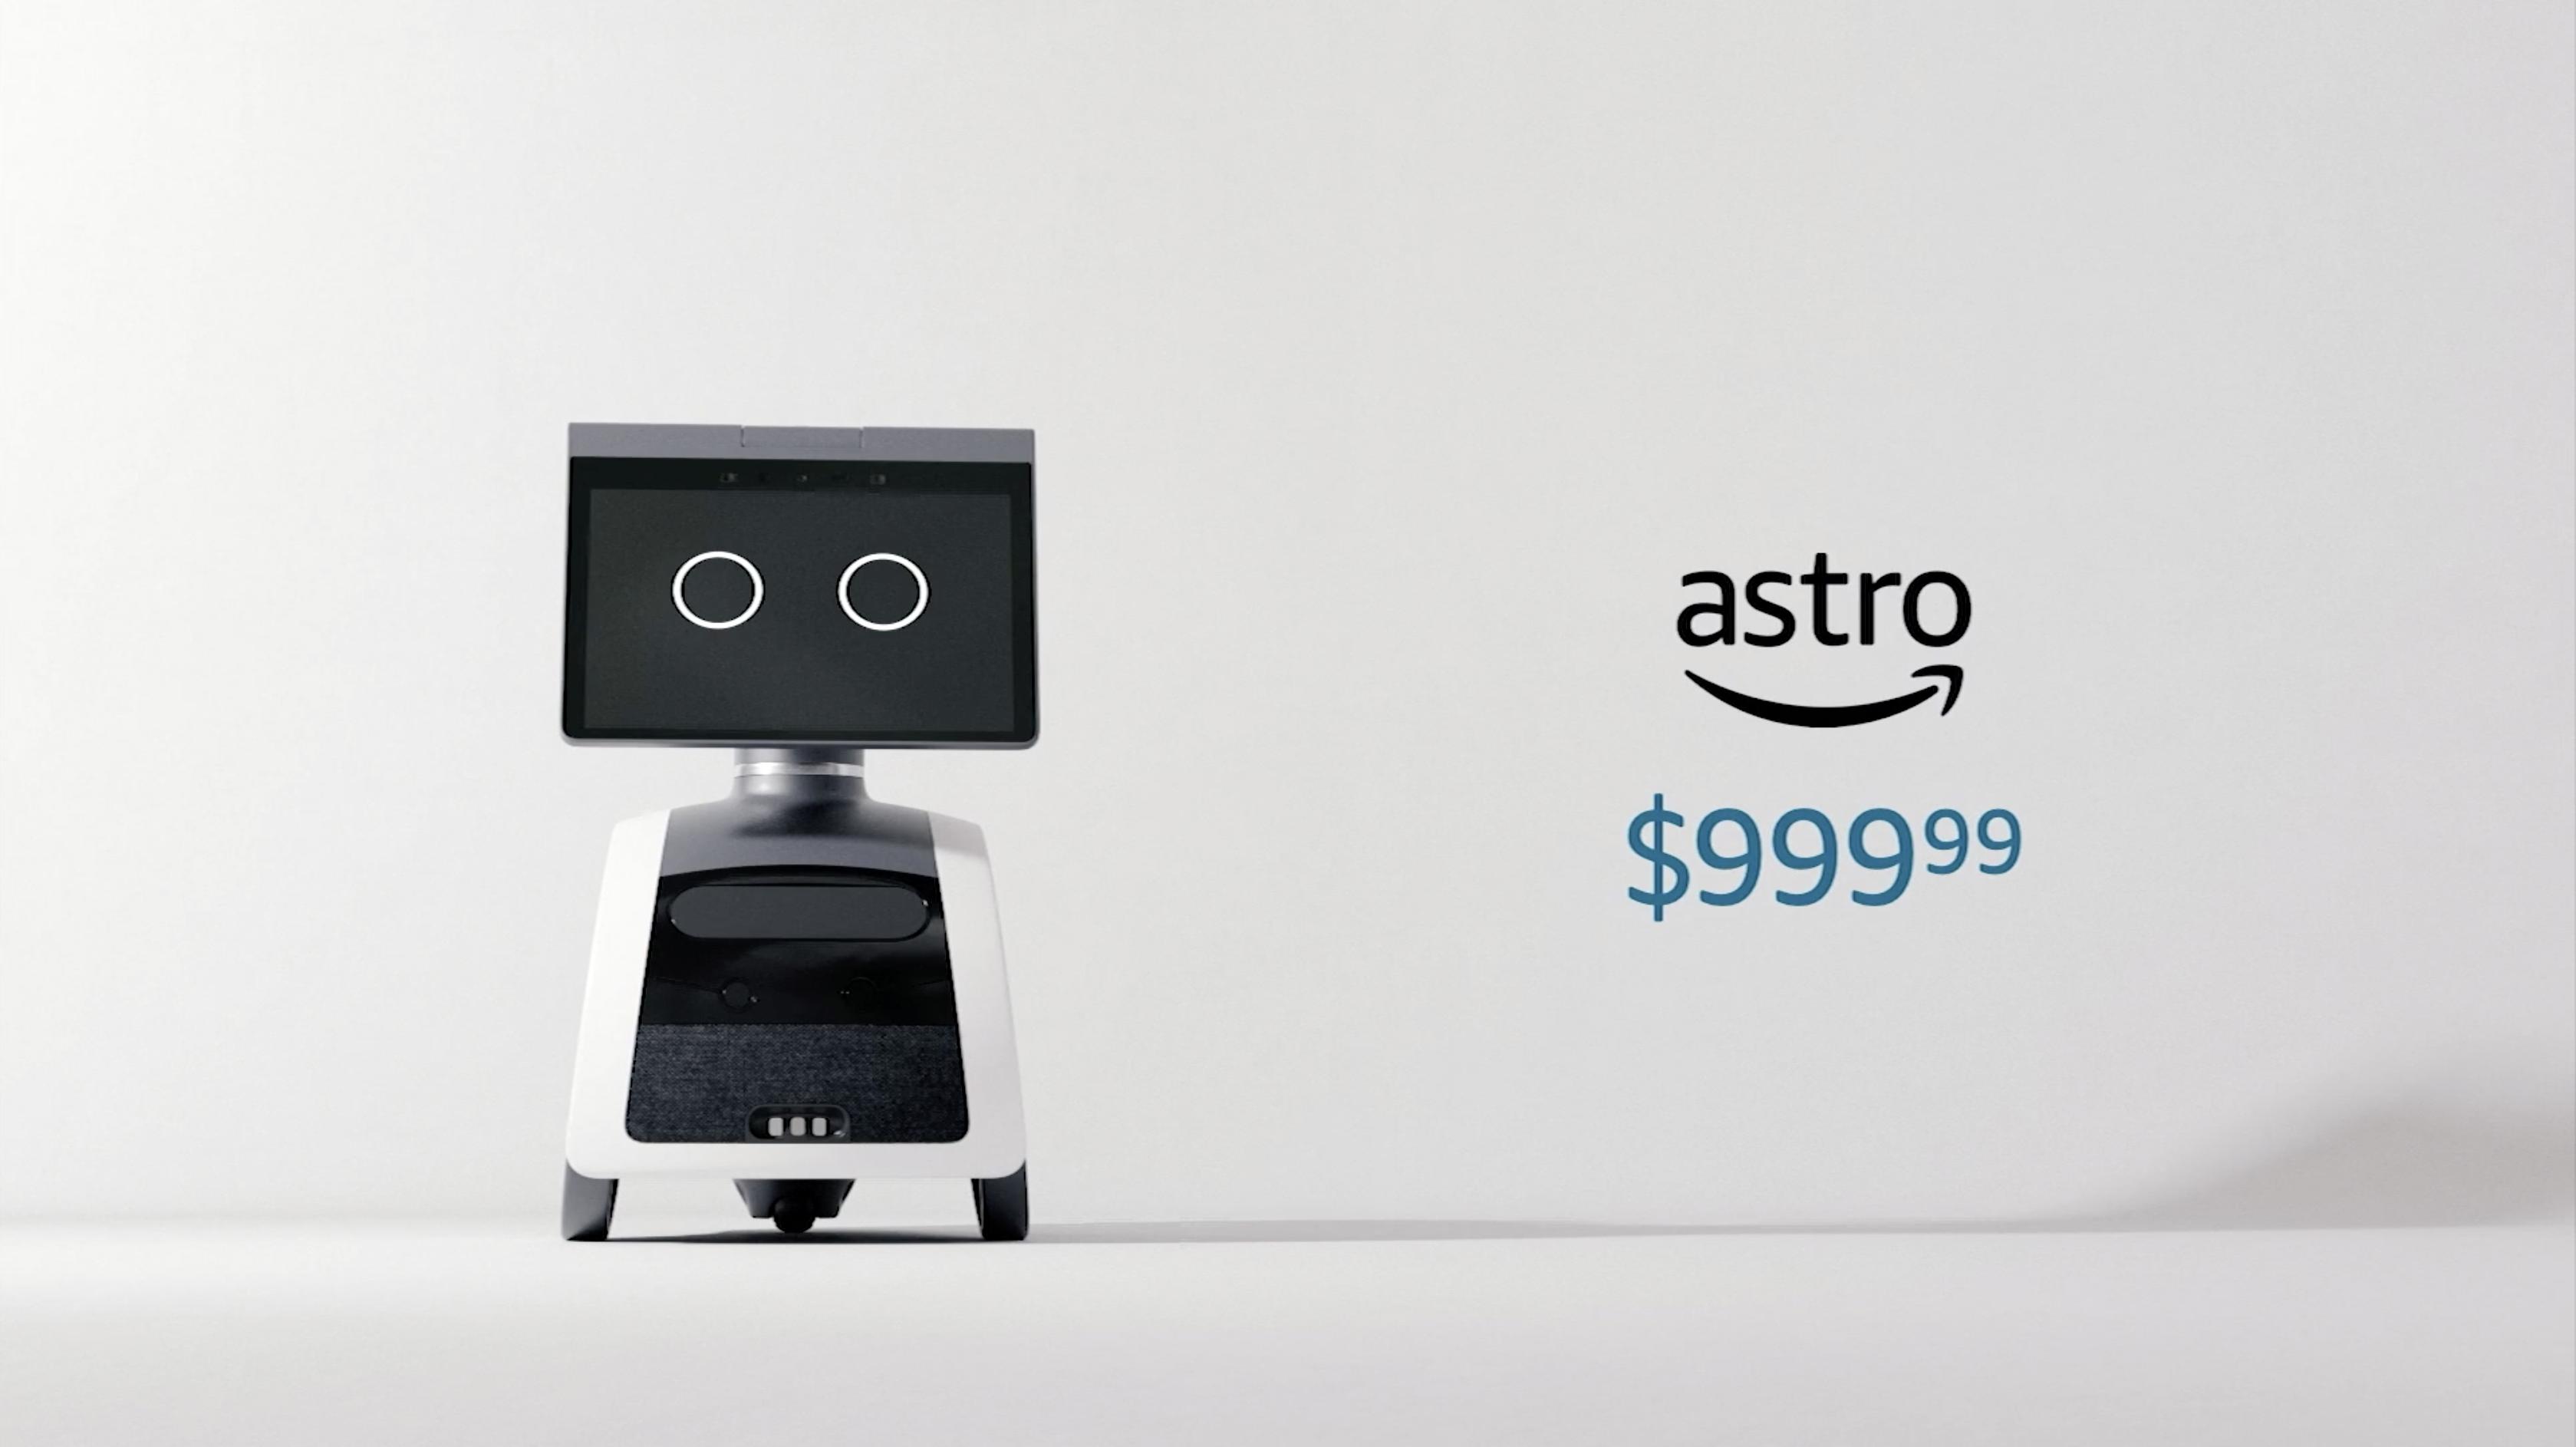 Amazon Astro debuted at Amazon event